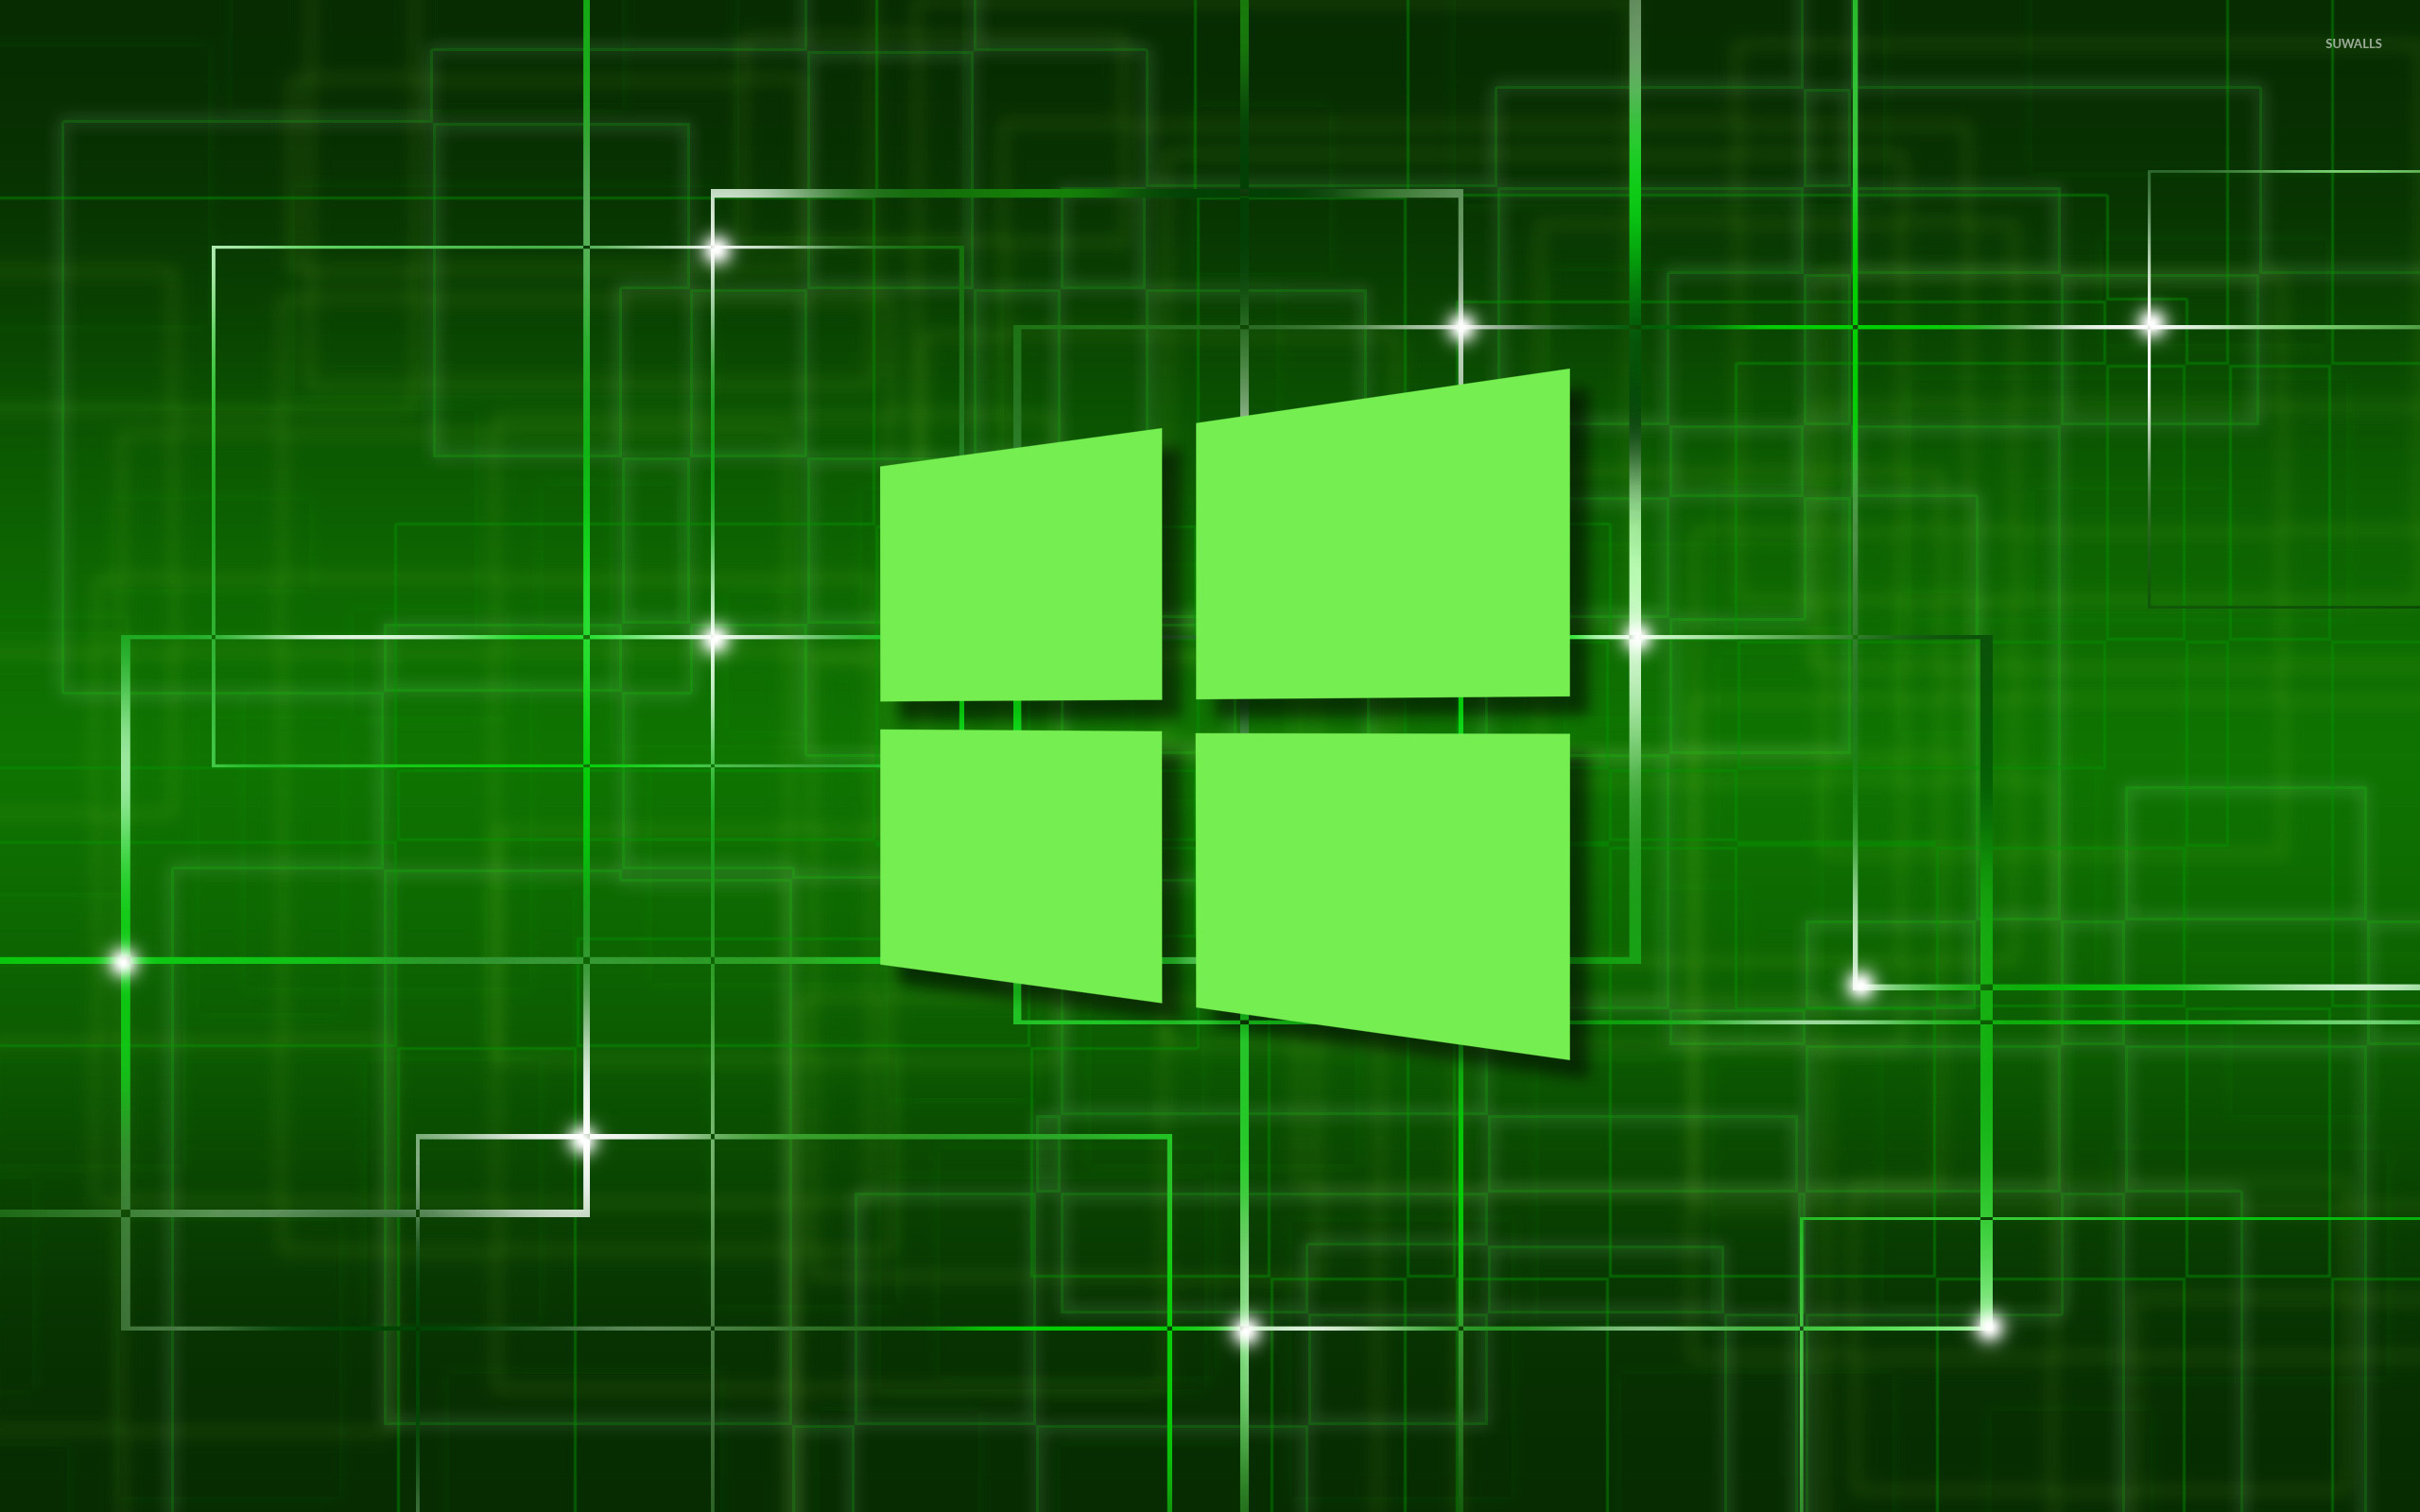 Windows 10 Green Simple Logo On A Network Wallpaper